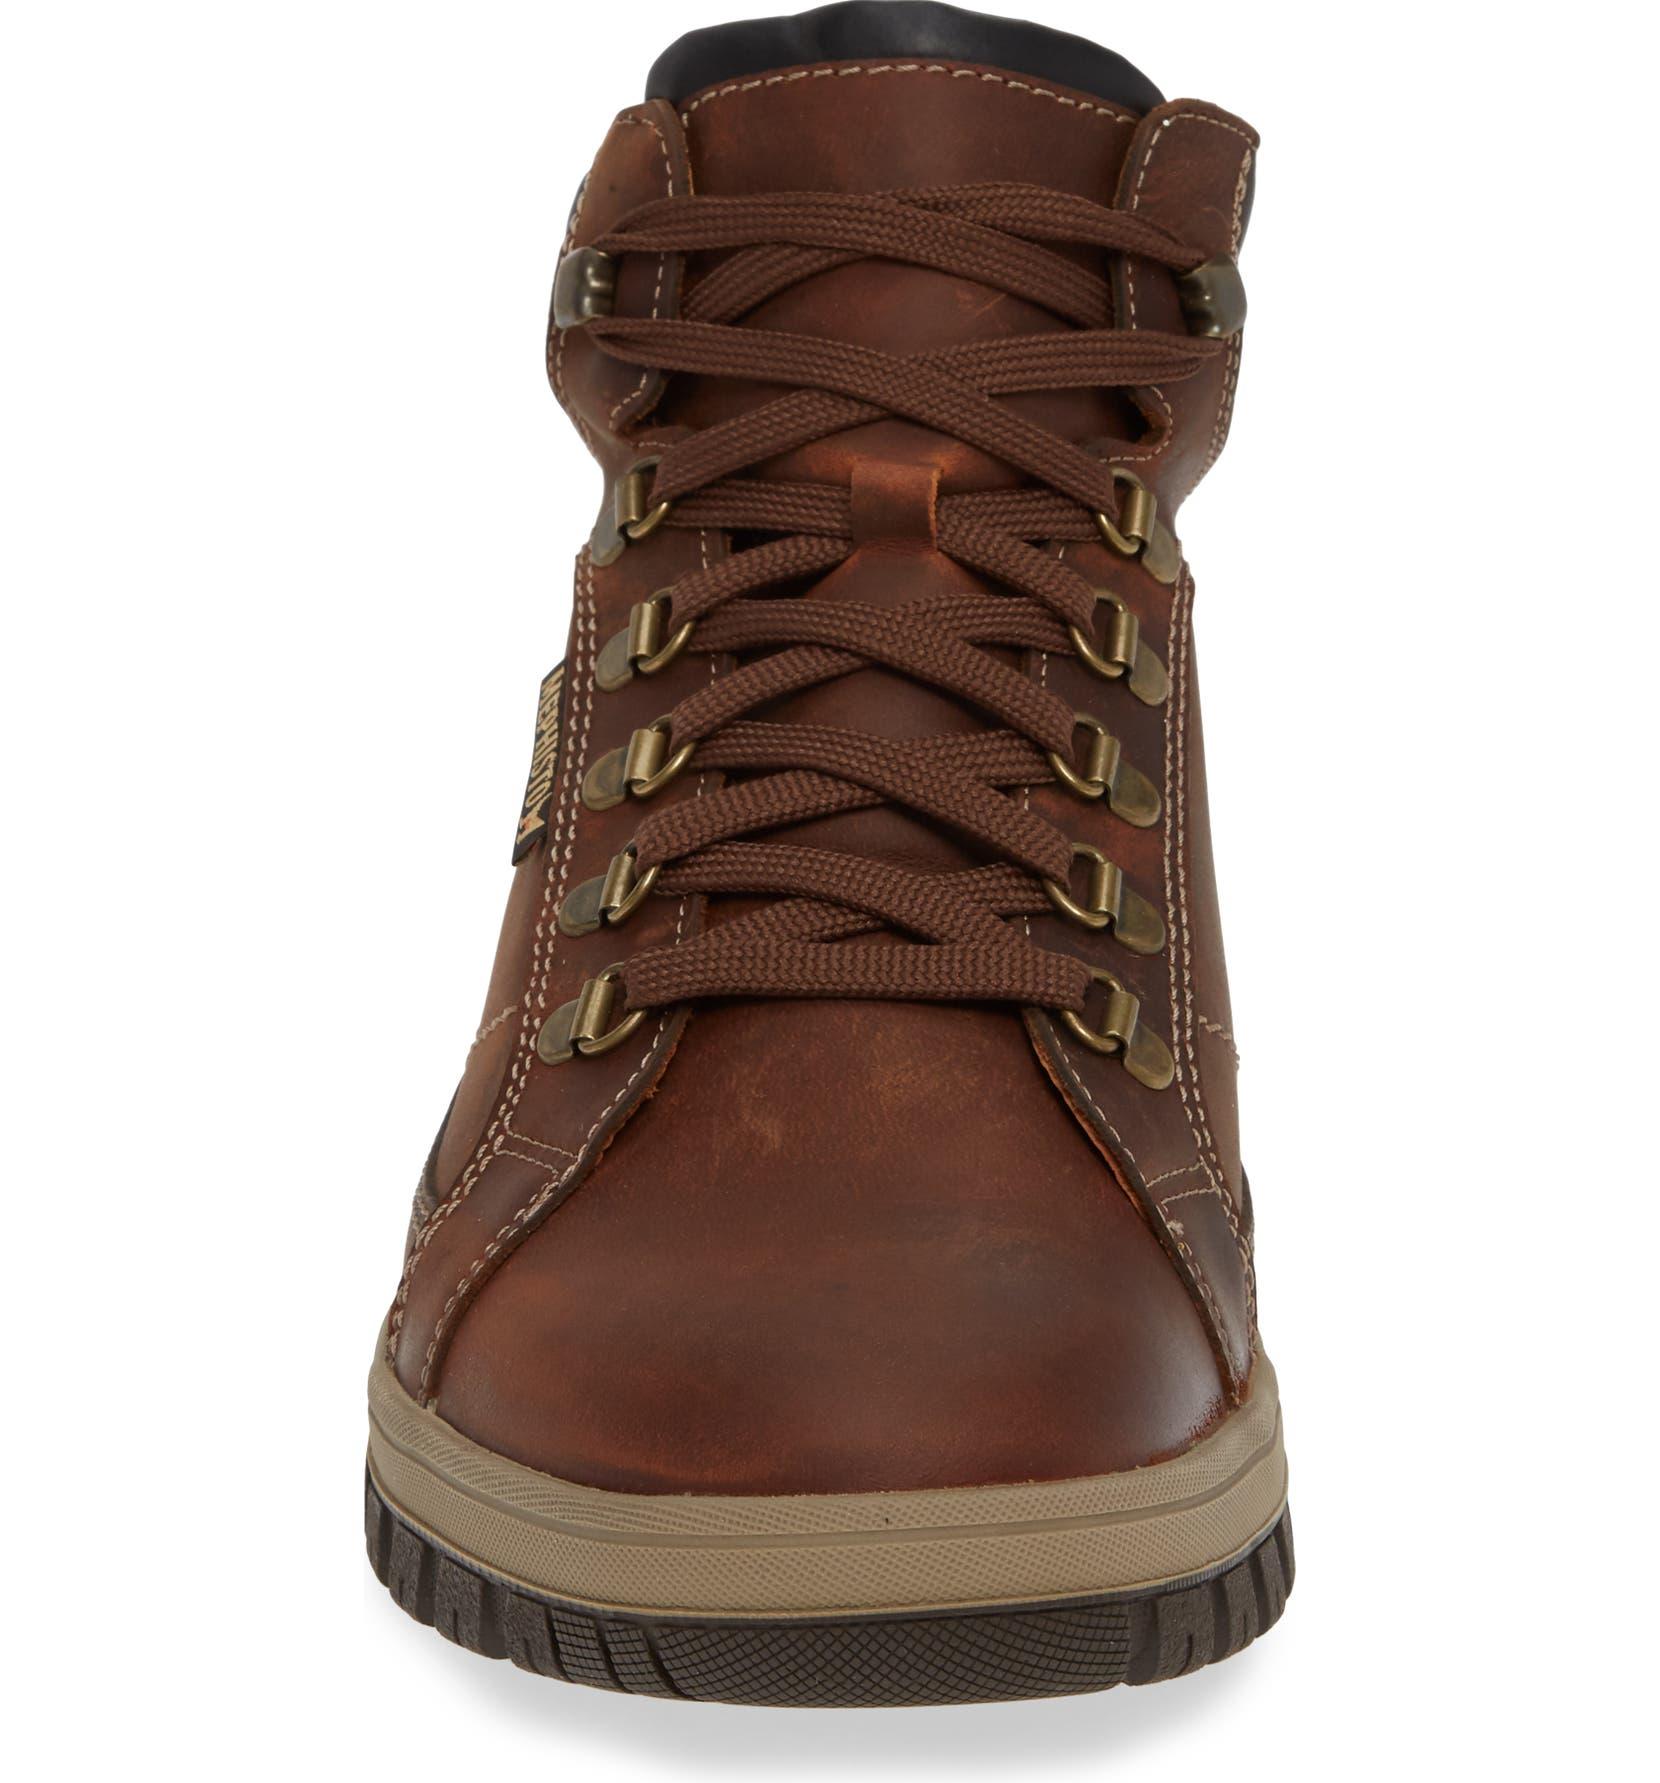 db98ca6050e9e6 Mephisto Pitt Mid Lace-Up Boot (Men)   Nordstrom